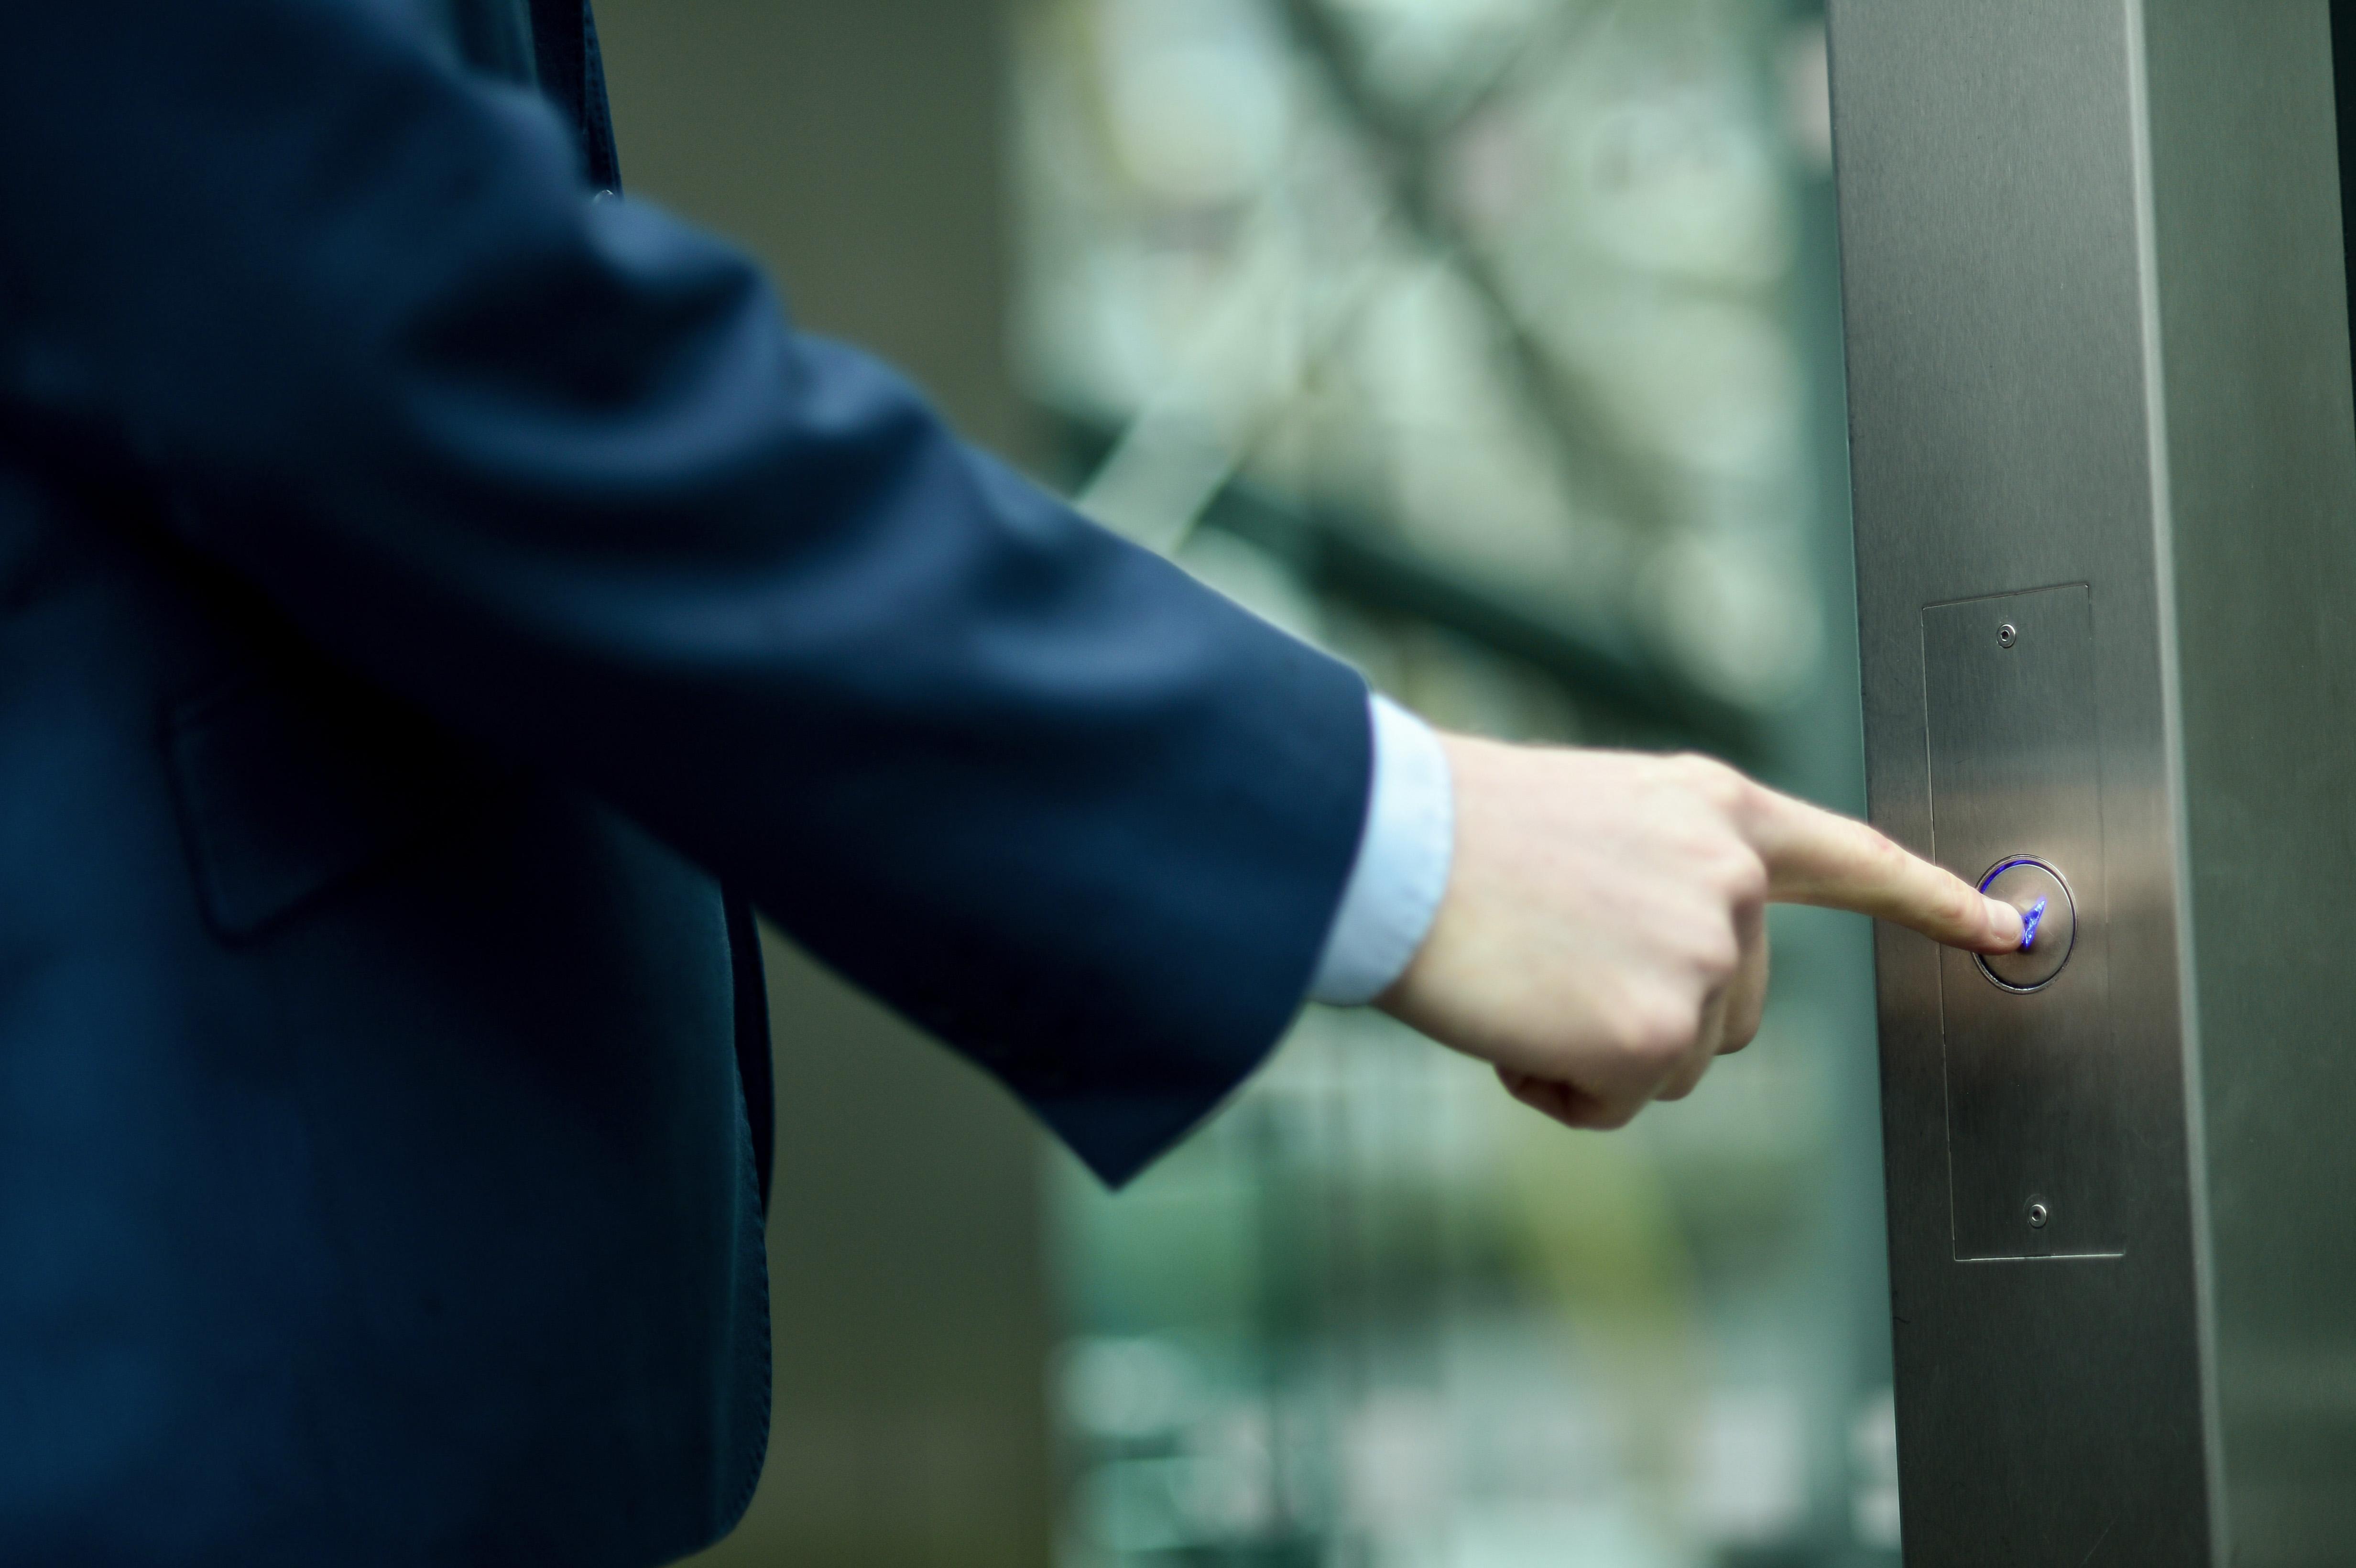 Le spese per l'ascensore